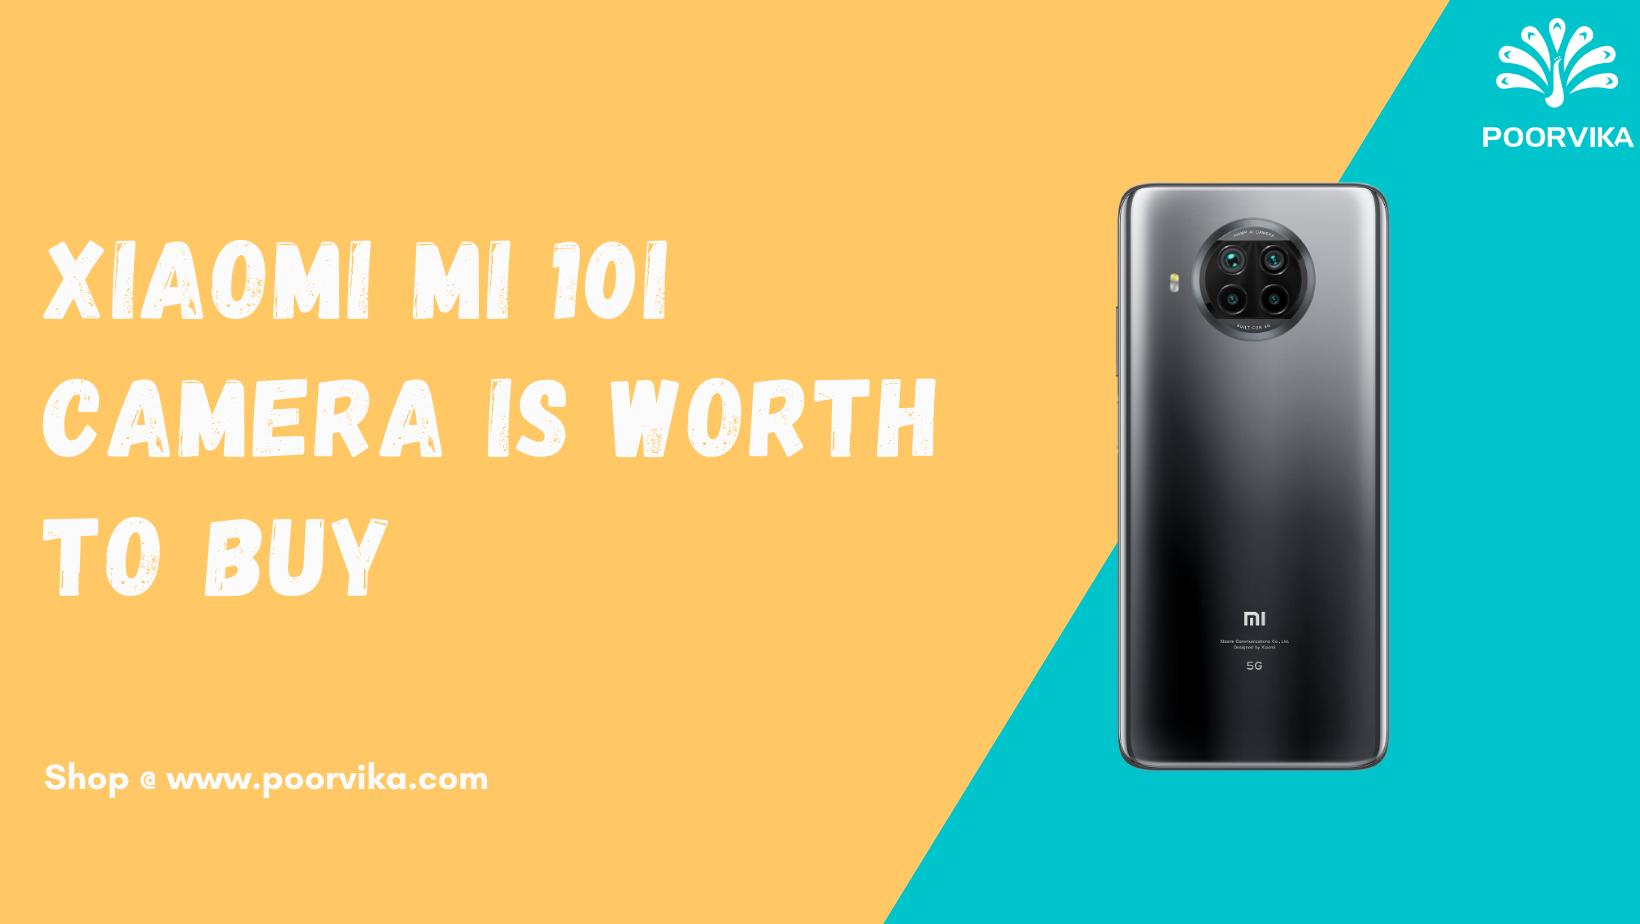 Xiaomi Mi 10i camera is worth to buy